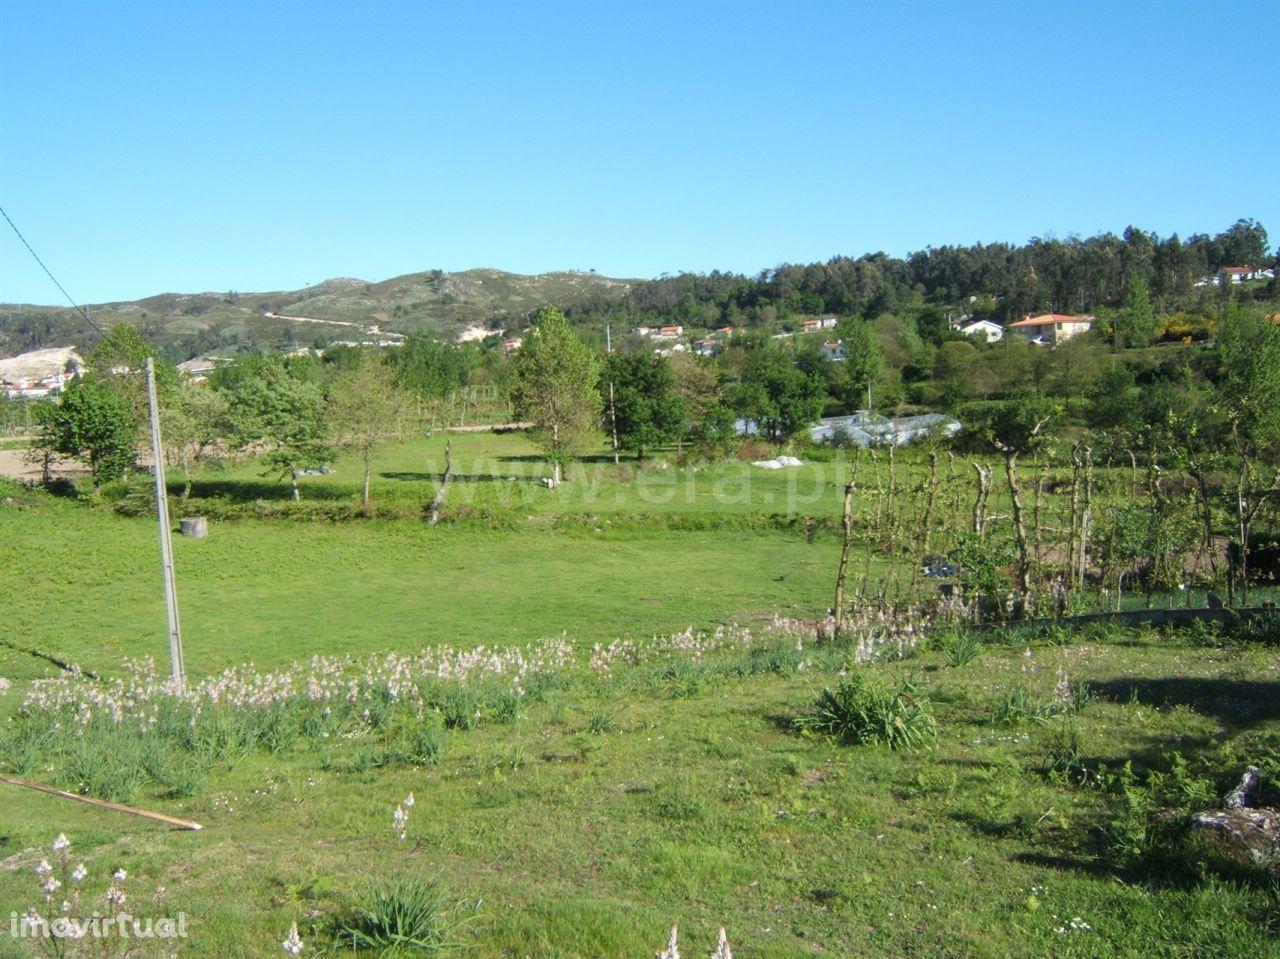 Terreno com 7.500 m2 em Quinchães